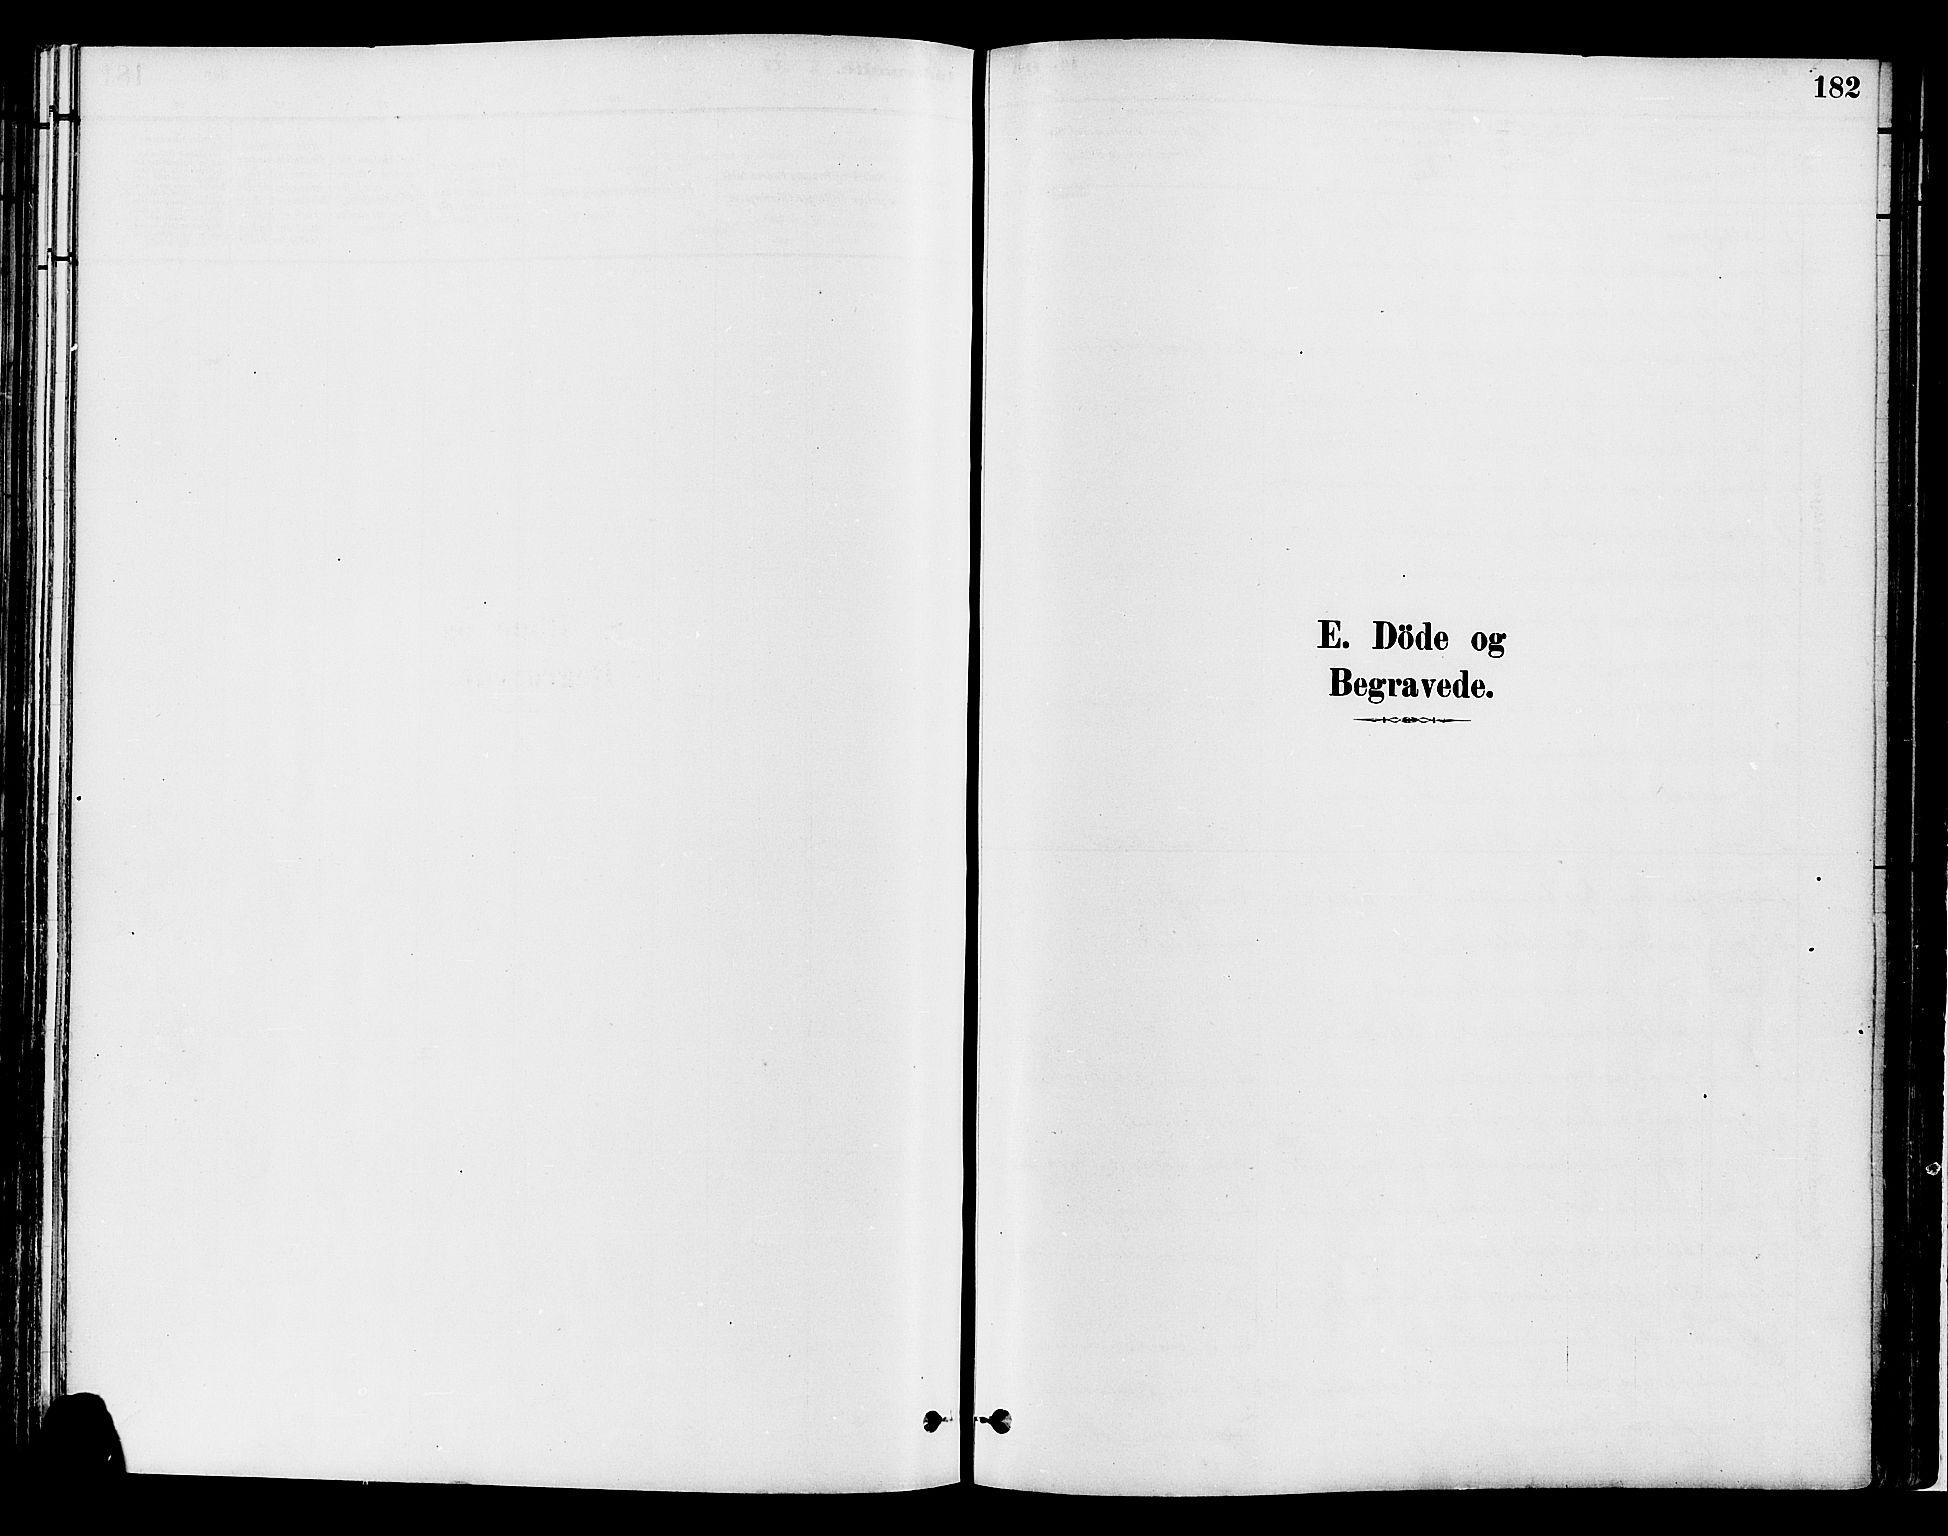 SAH, Gran prestekontor, Ministerialbok nr. 14, 1880-1889, s. 182